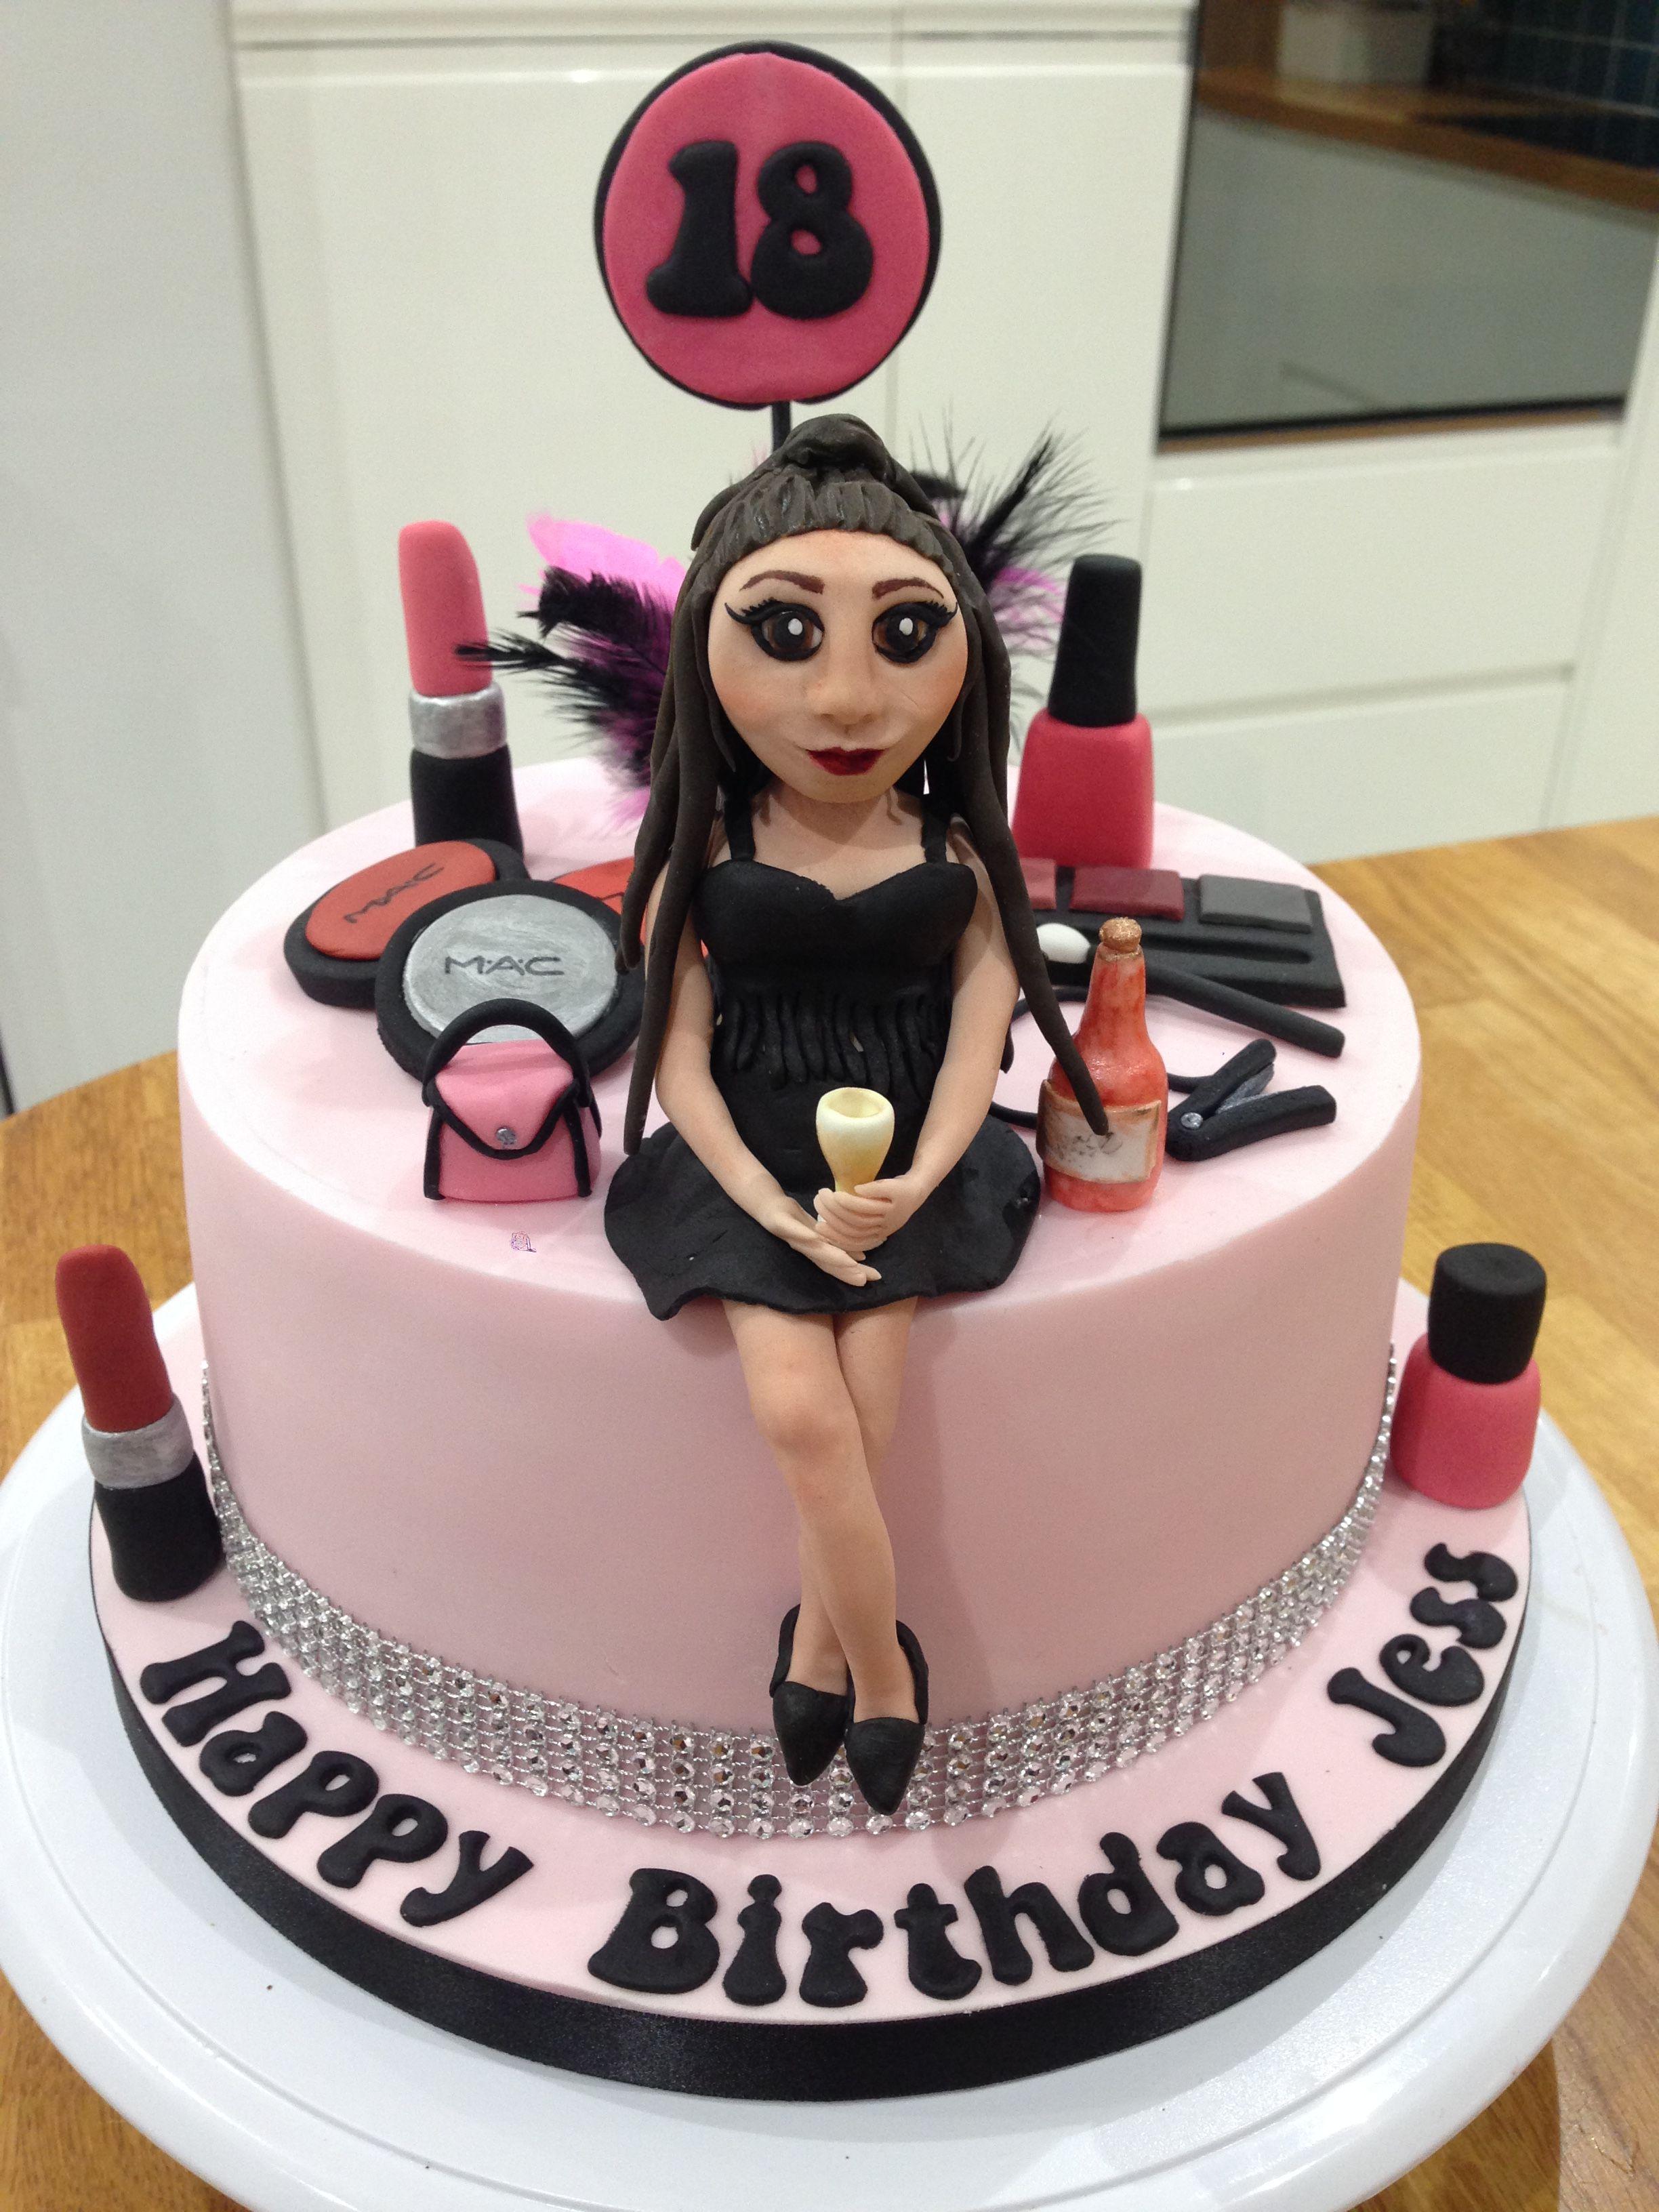 18th birthday cake girl 18th birthday cake for girls